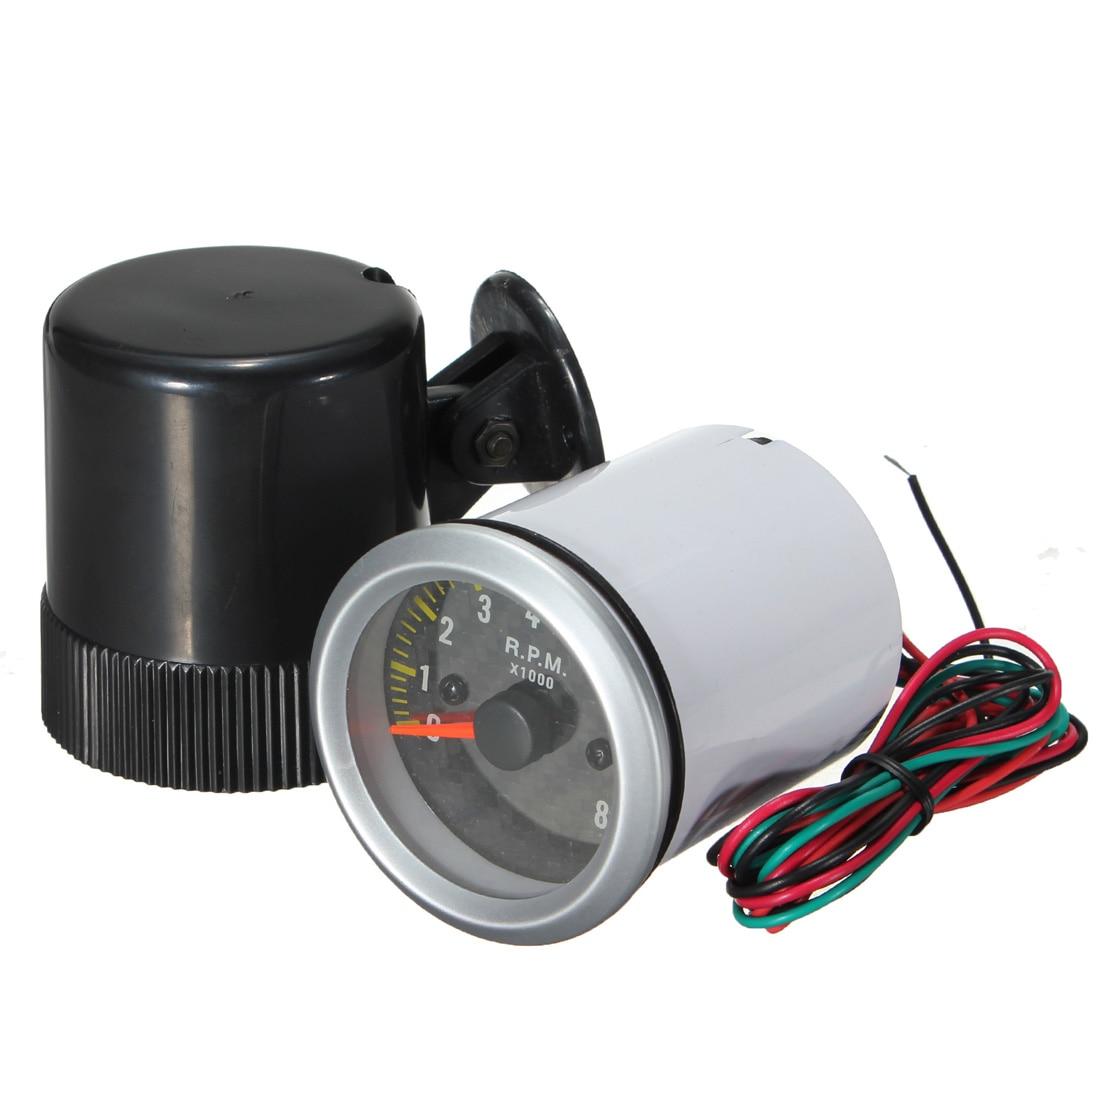 2 zoll 52mm 0-8000 rpm Rev Tacho Gauge Auto Tachometer Carbon Fiber Gesicht Gelbe LED